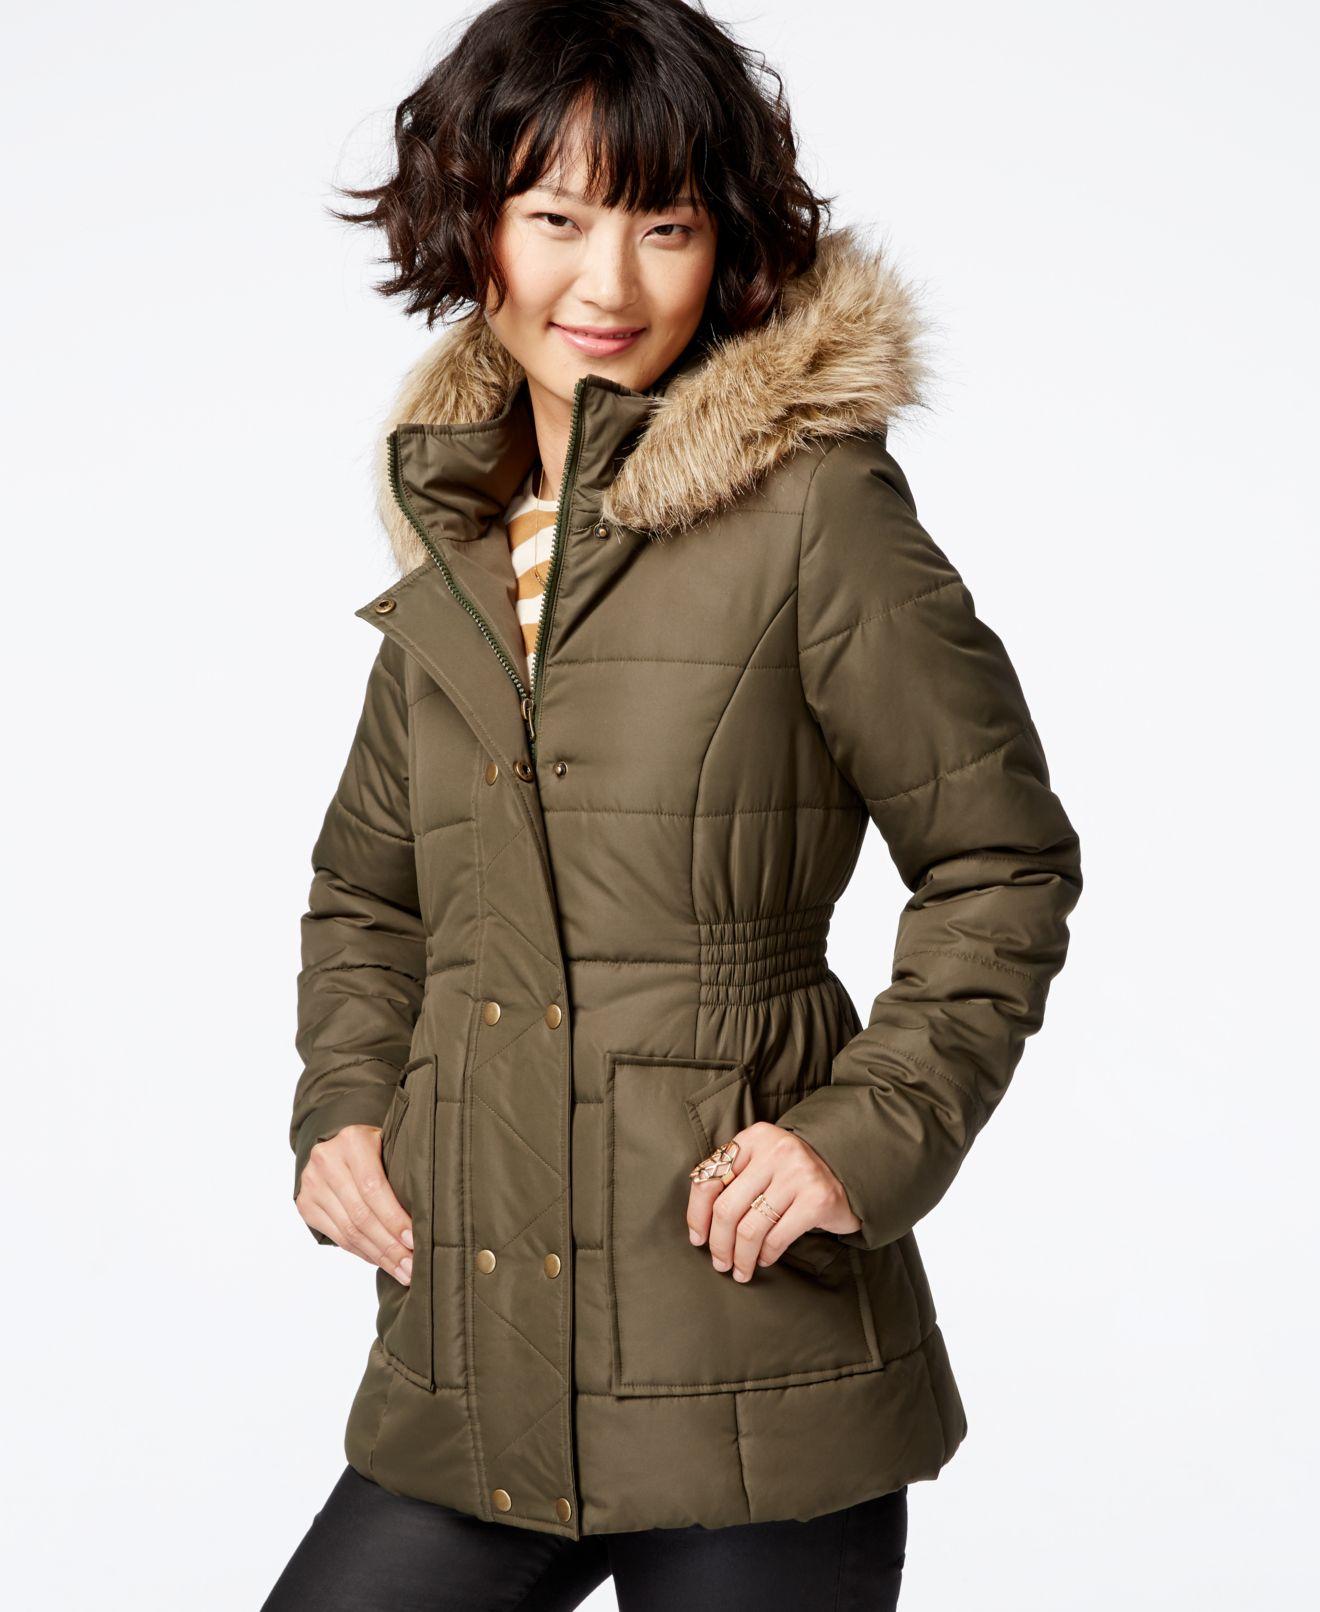 junior girls clothing websites - Kids Clothes Zone